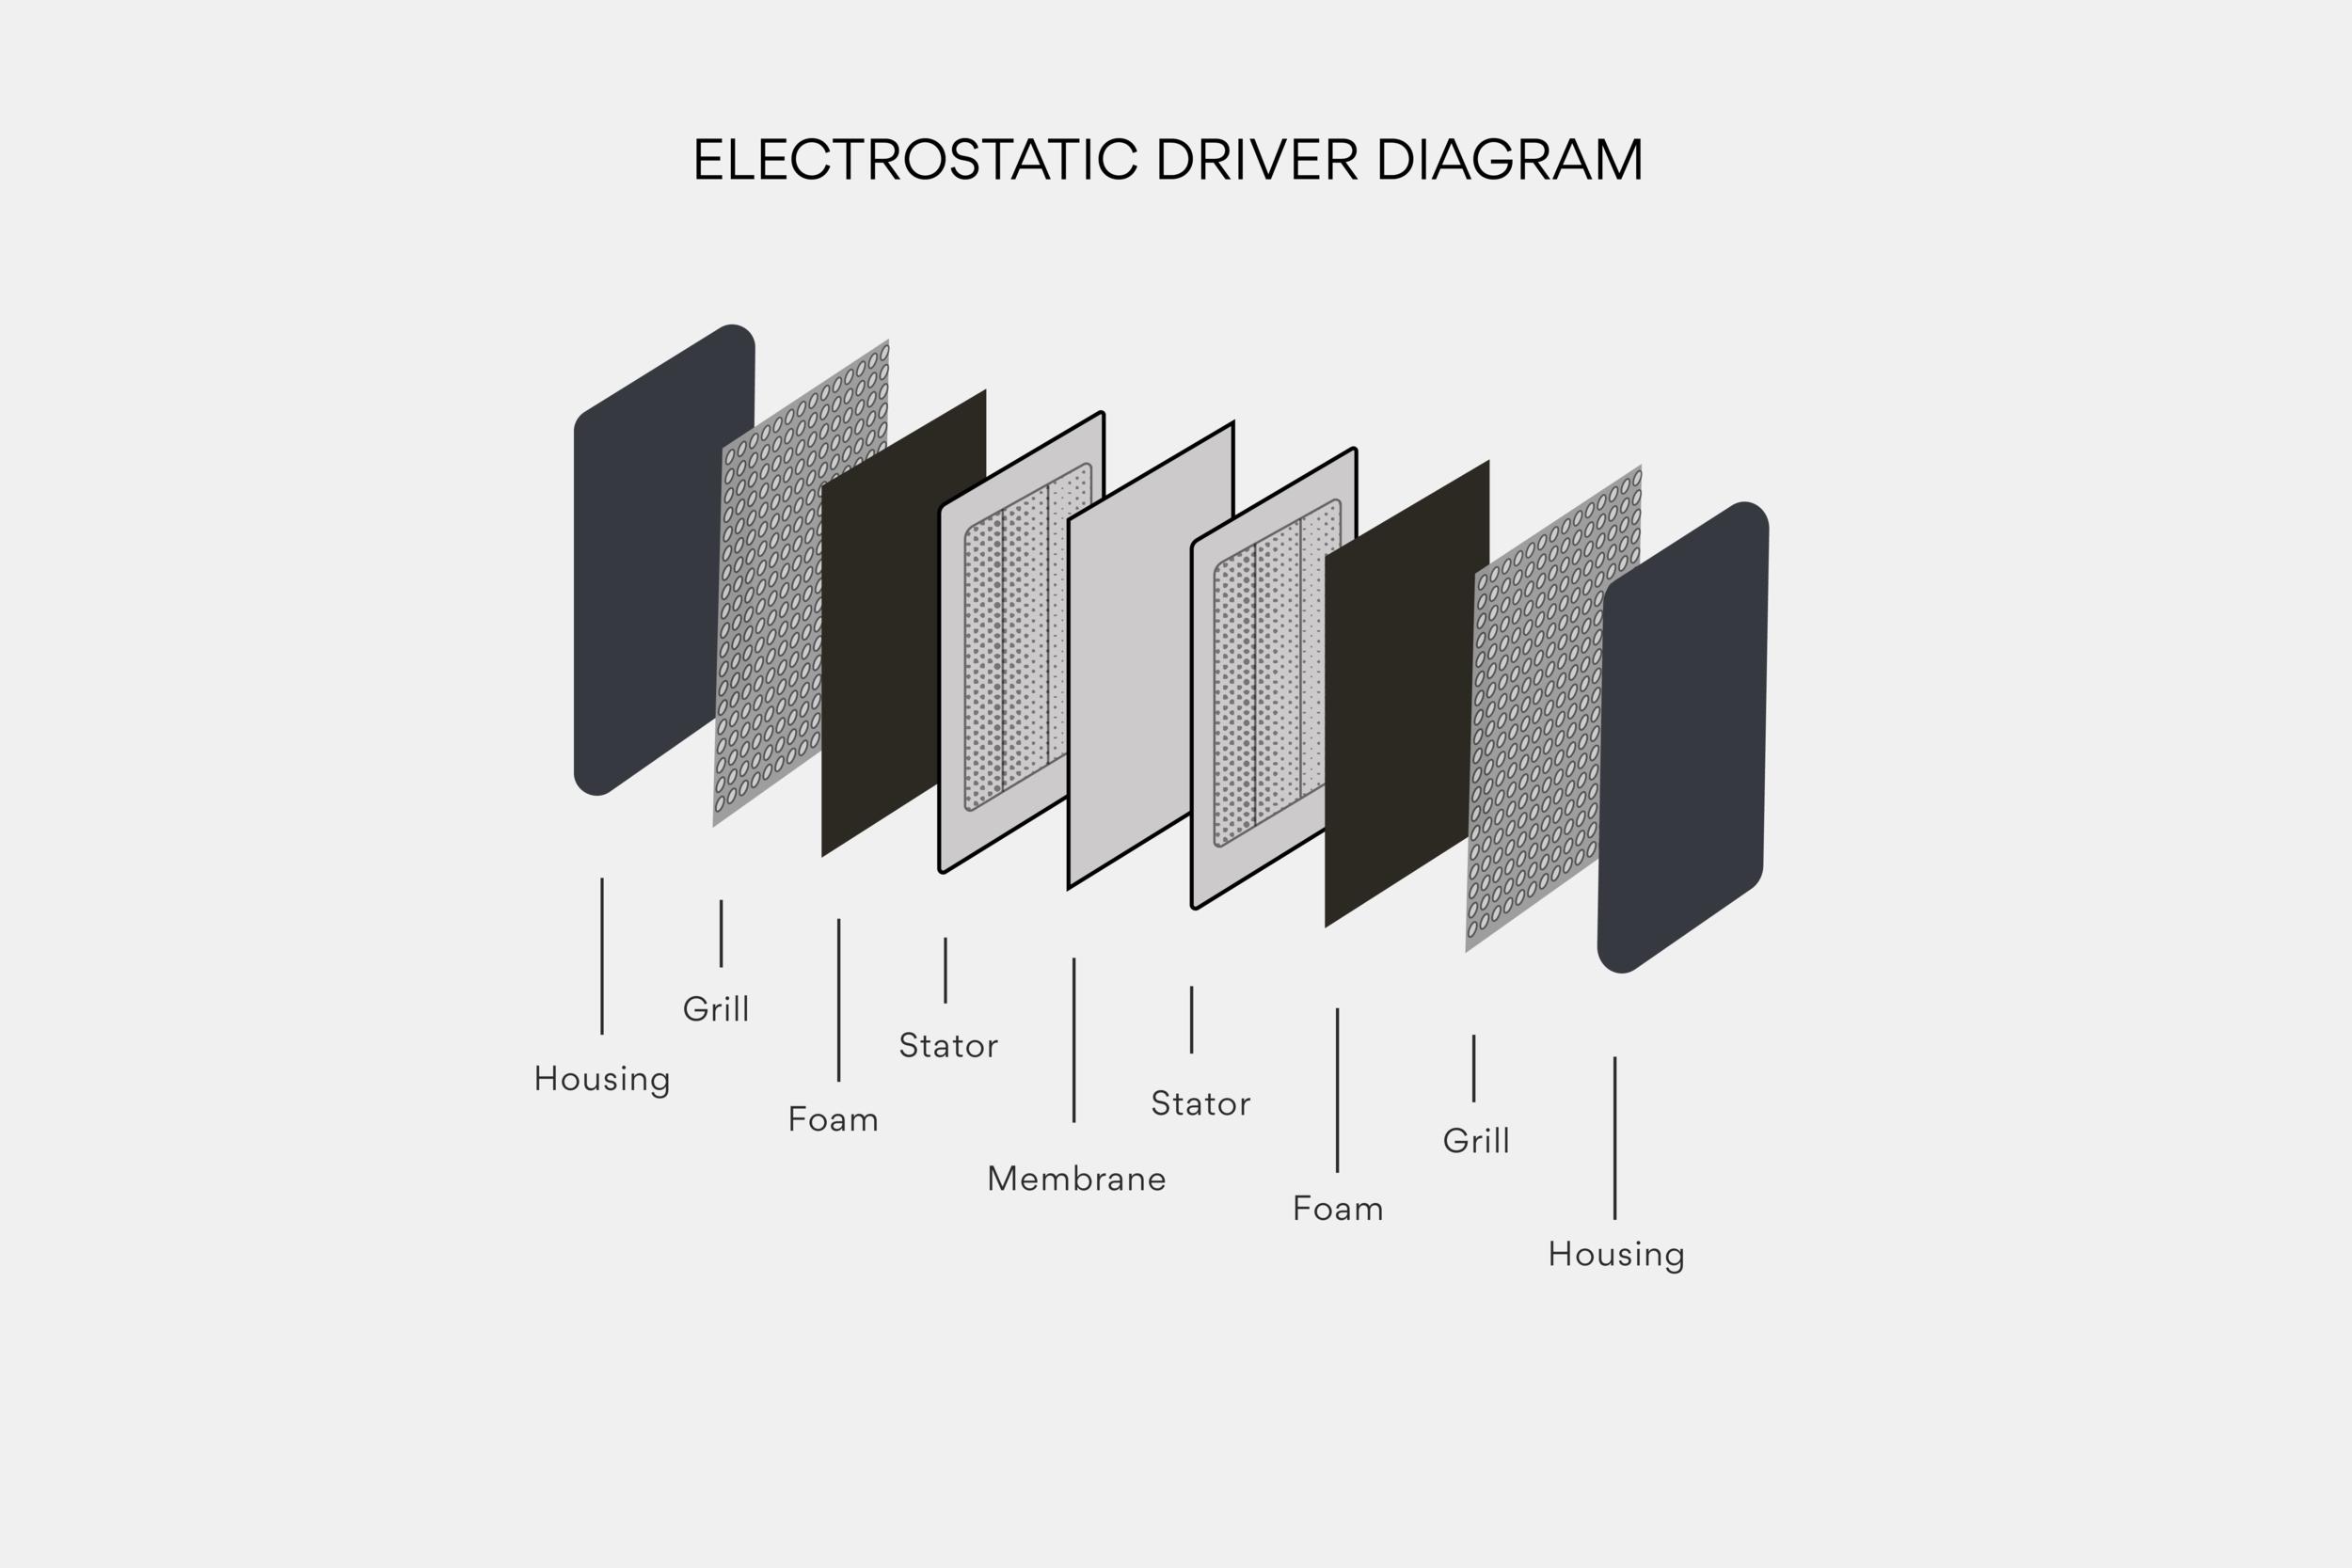 electrostatic diagram-01.png